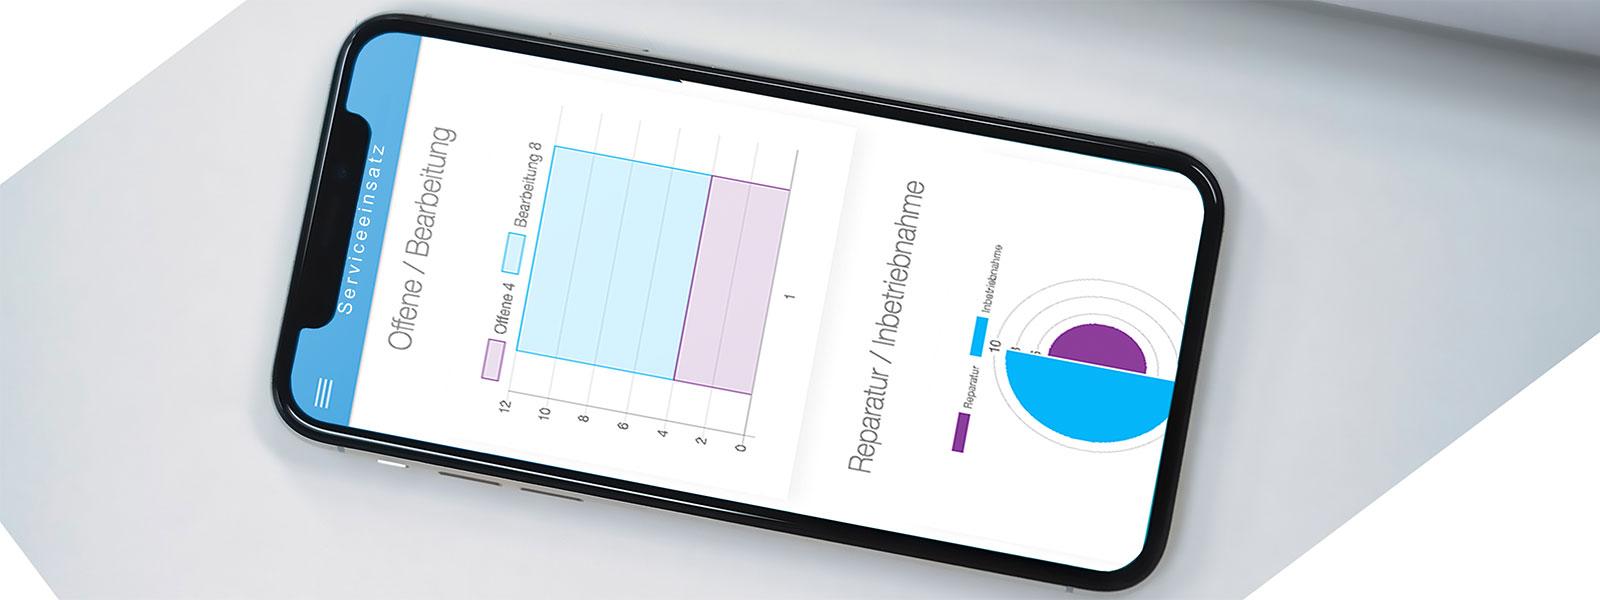 Ingerson Consultung GmbH in Düsseldorf - Business Apps